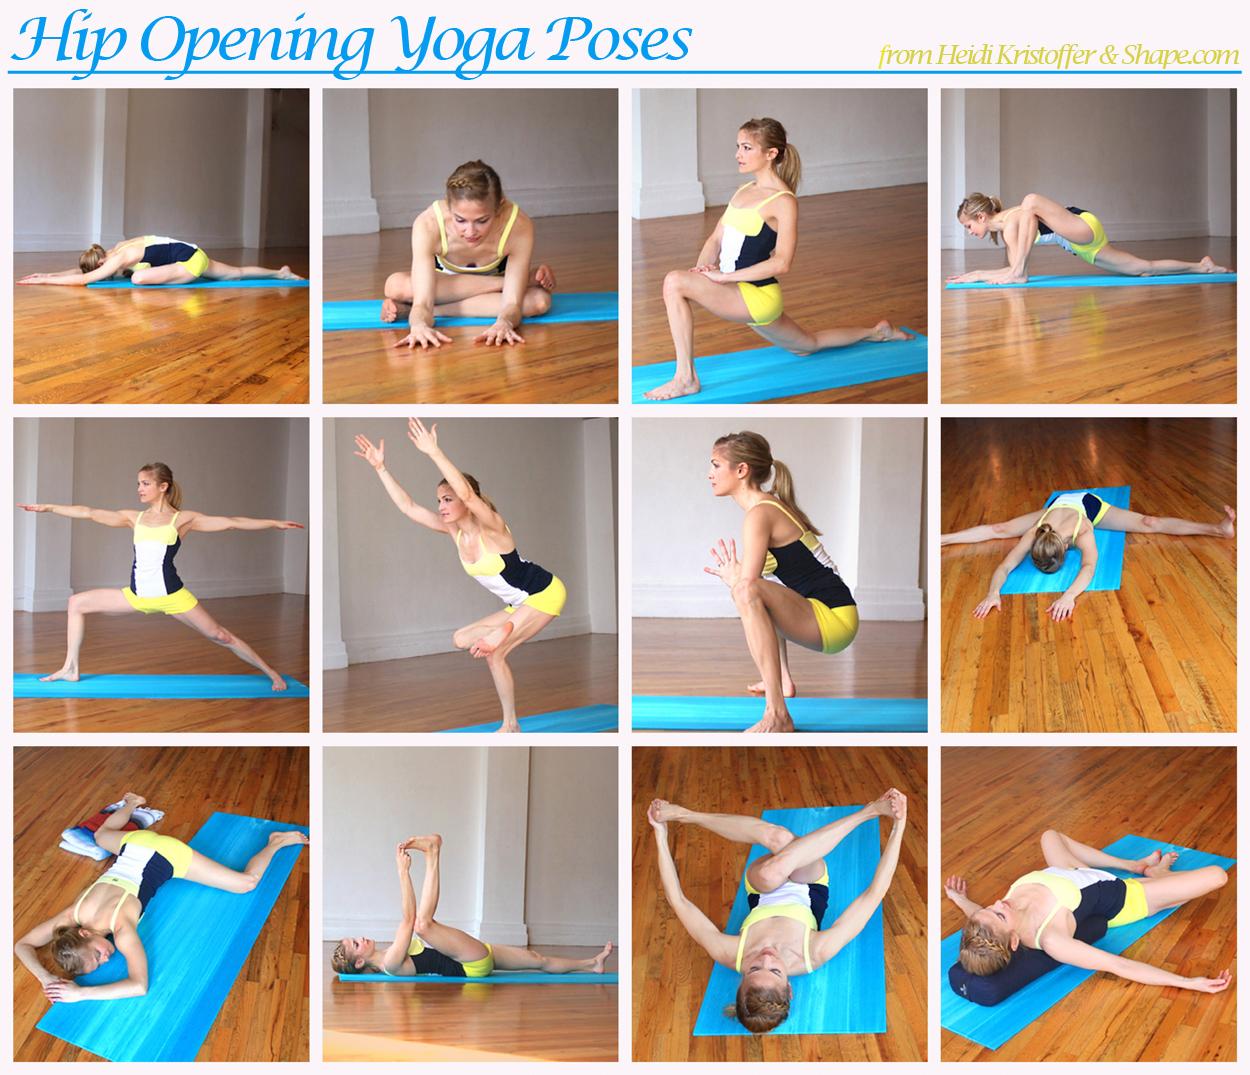 hip-opening-yoga-poses